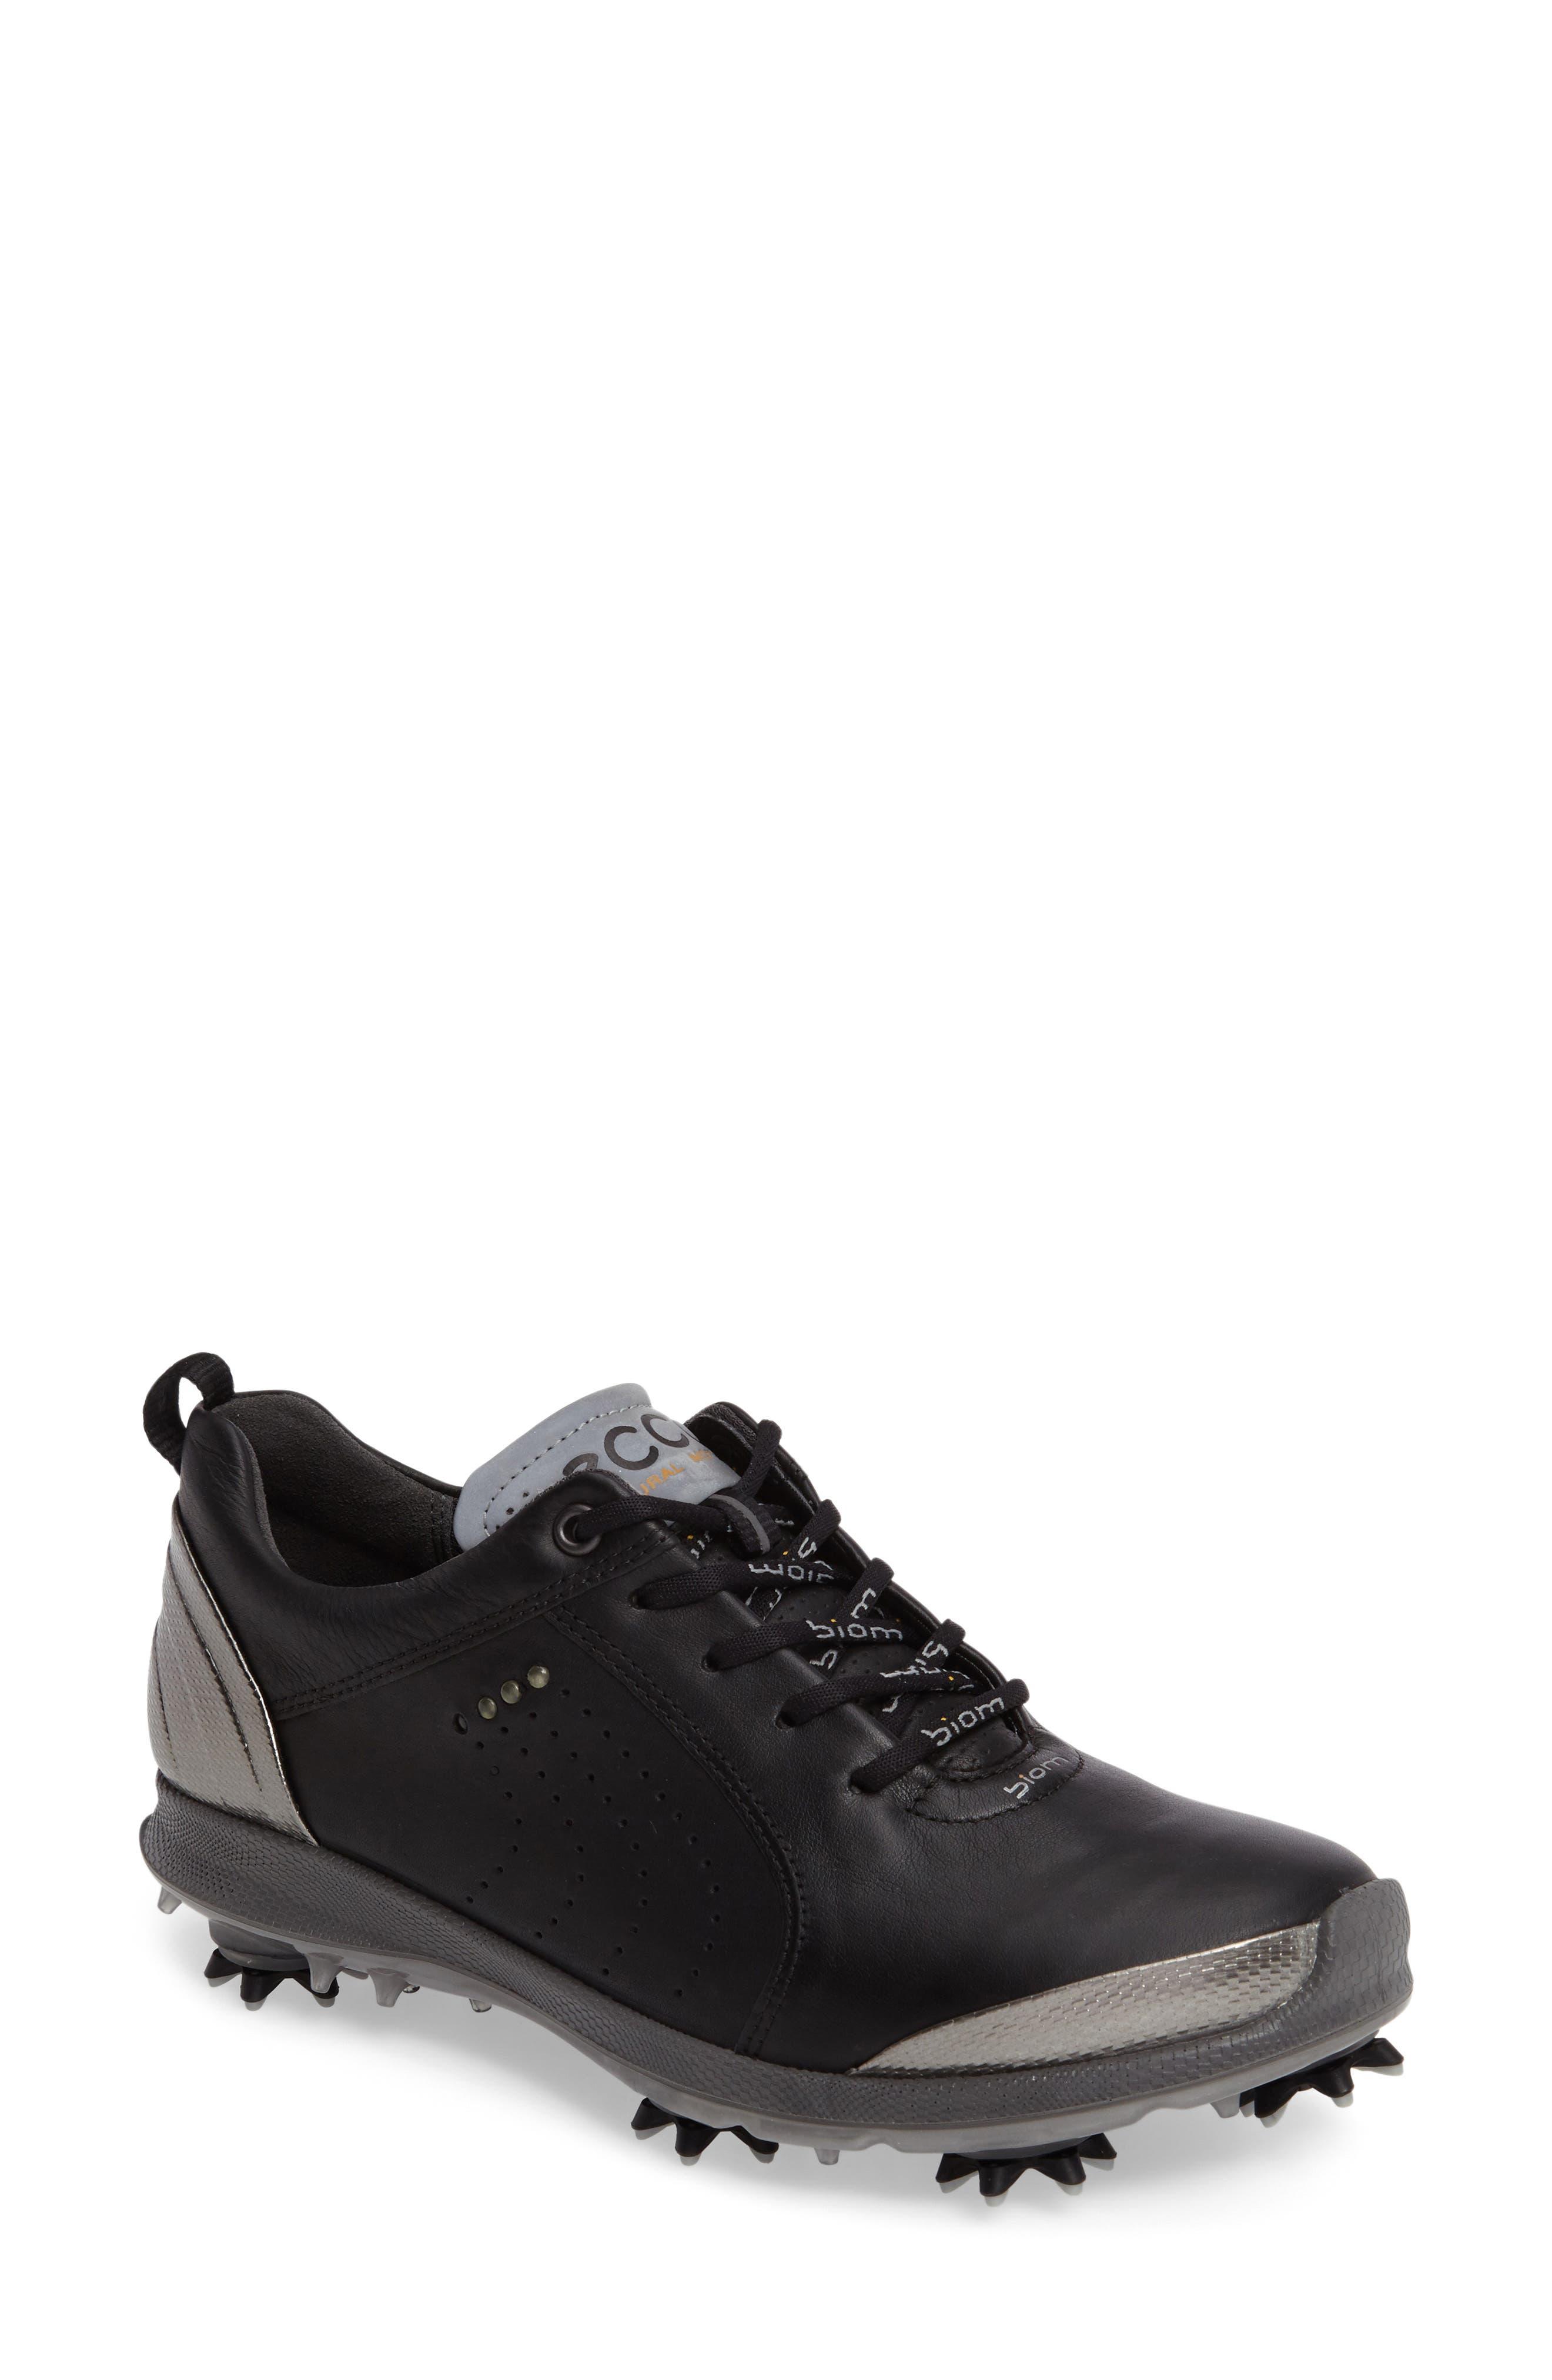 BIOM 2 Waterproof Golf Shoe,                         Main,                         color, BLACK/ BUFFED SILVER LEATHER